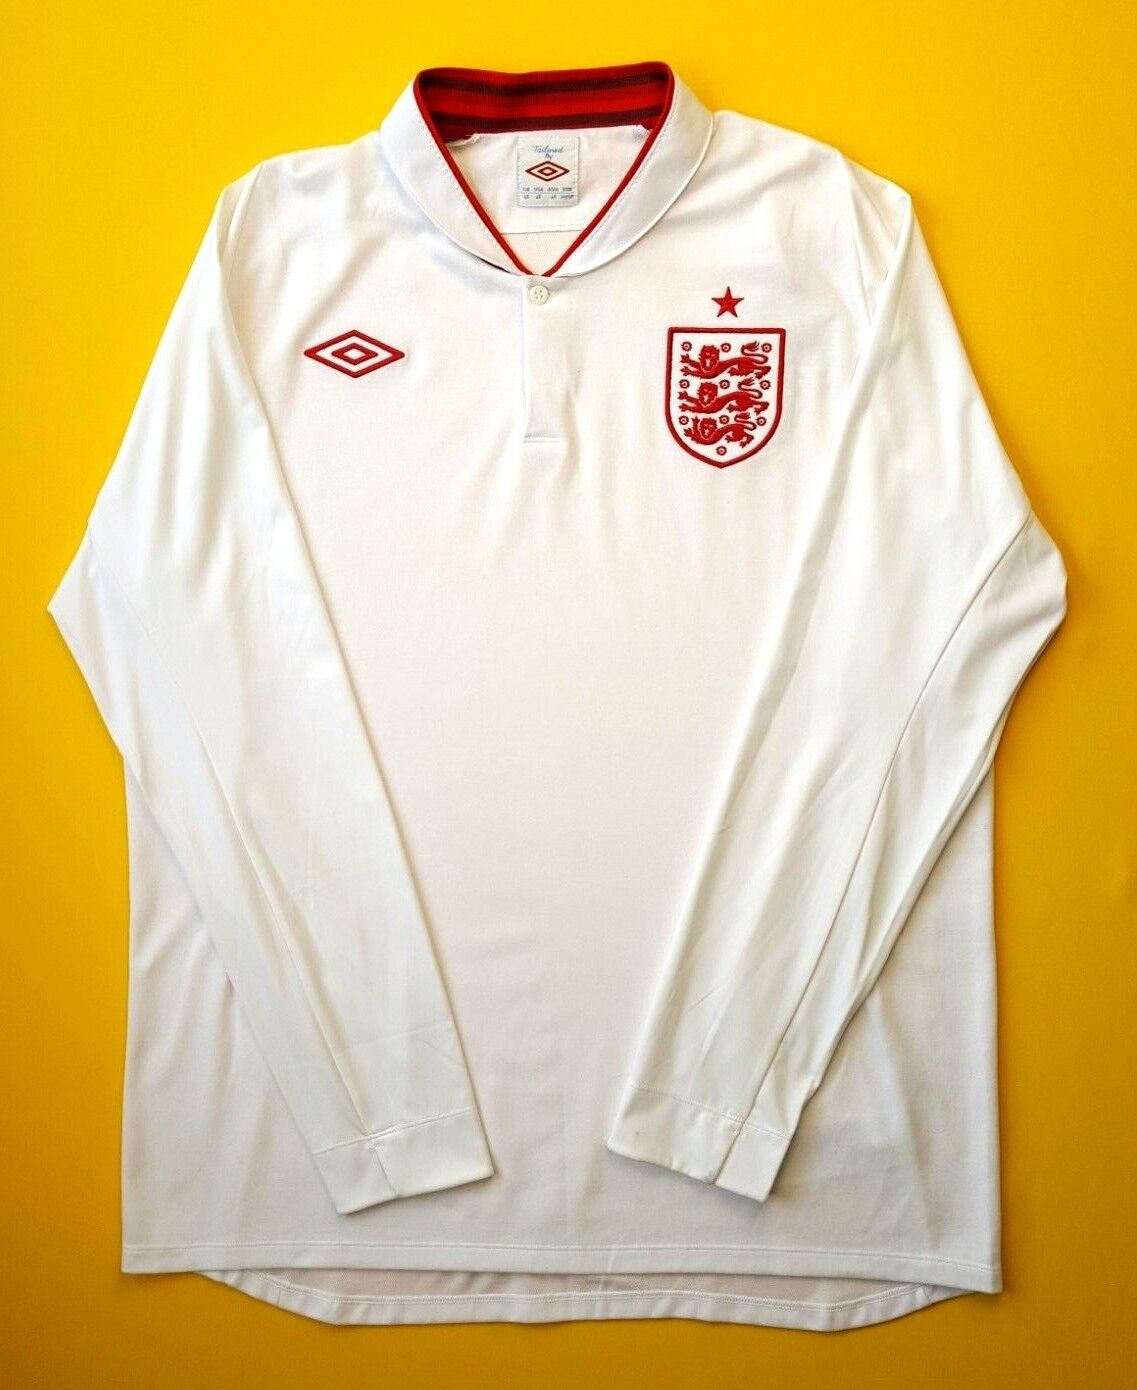 e21d76514 5+ England soccer jersey s. 2012 home long sleeve shirt football Umbro ig93  46 5 nqfpwk6258-Soccer-National Teams